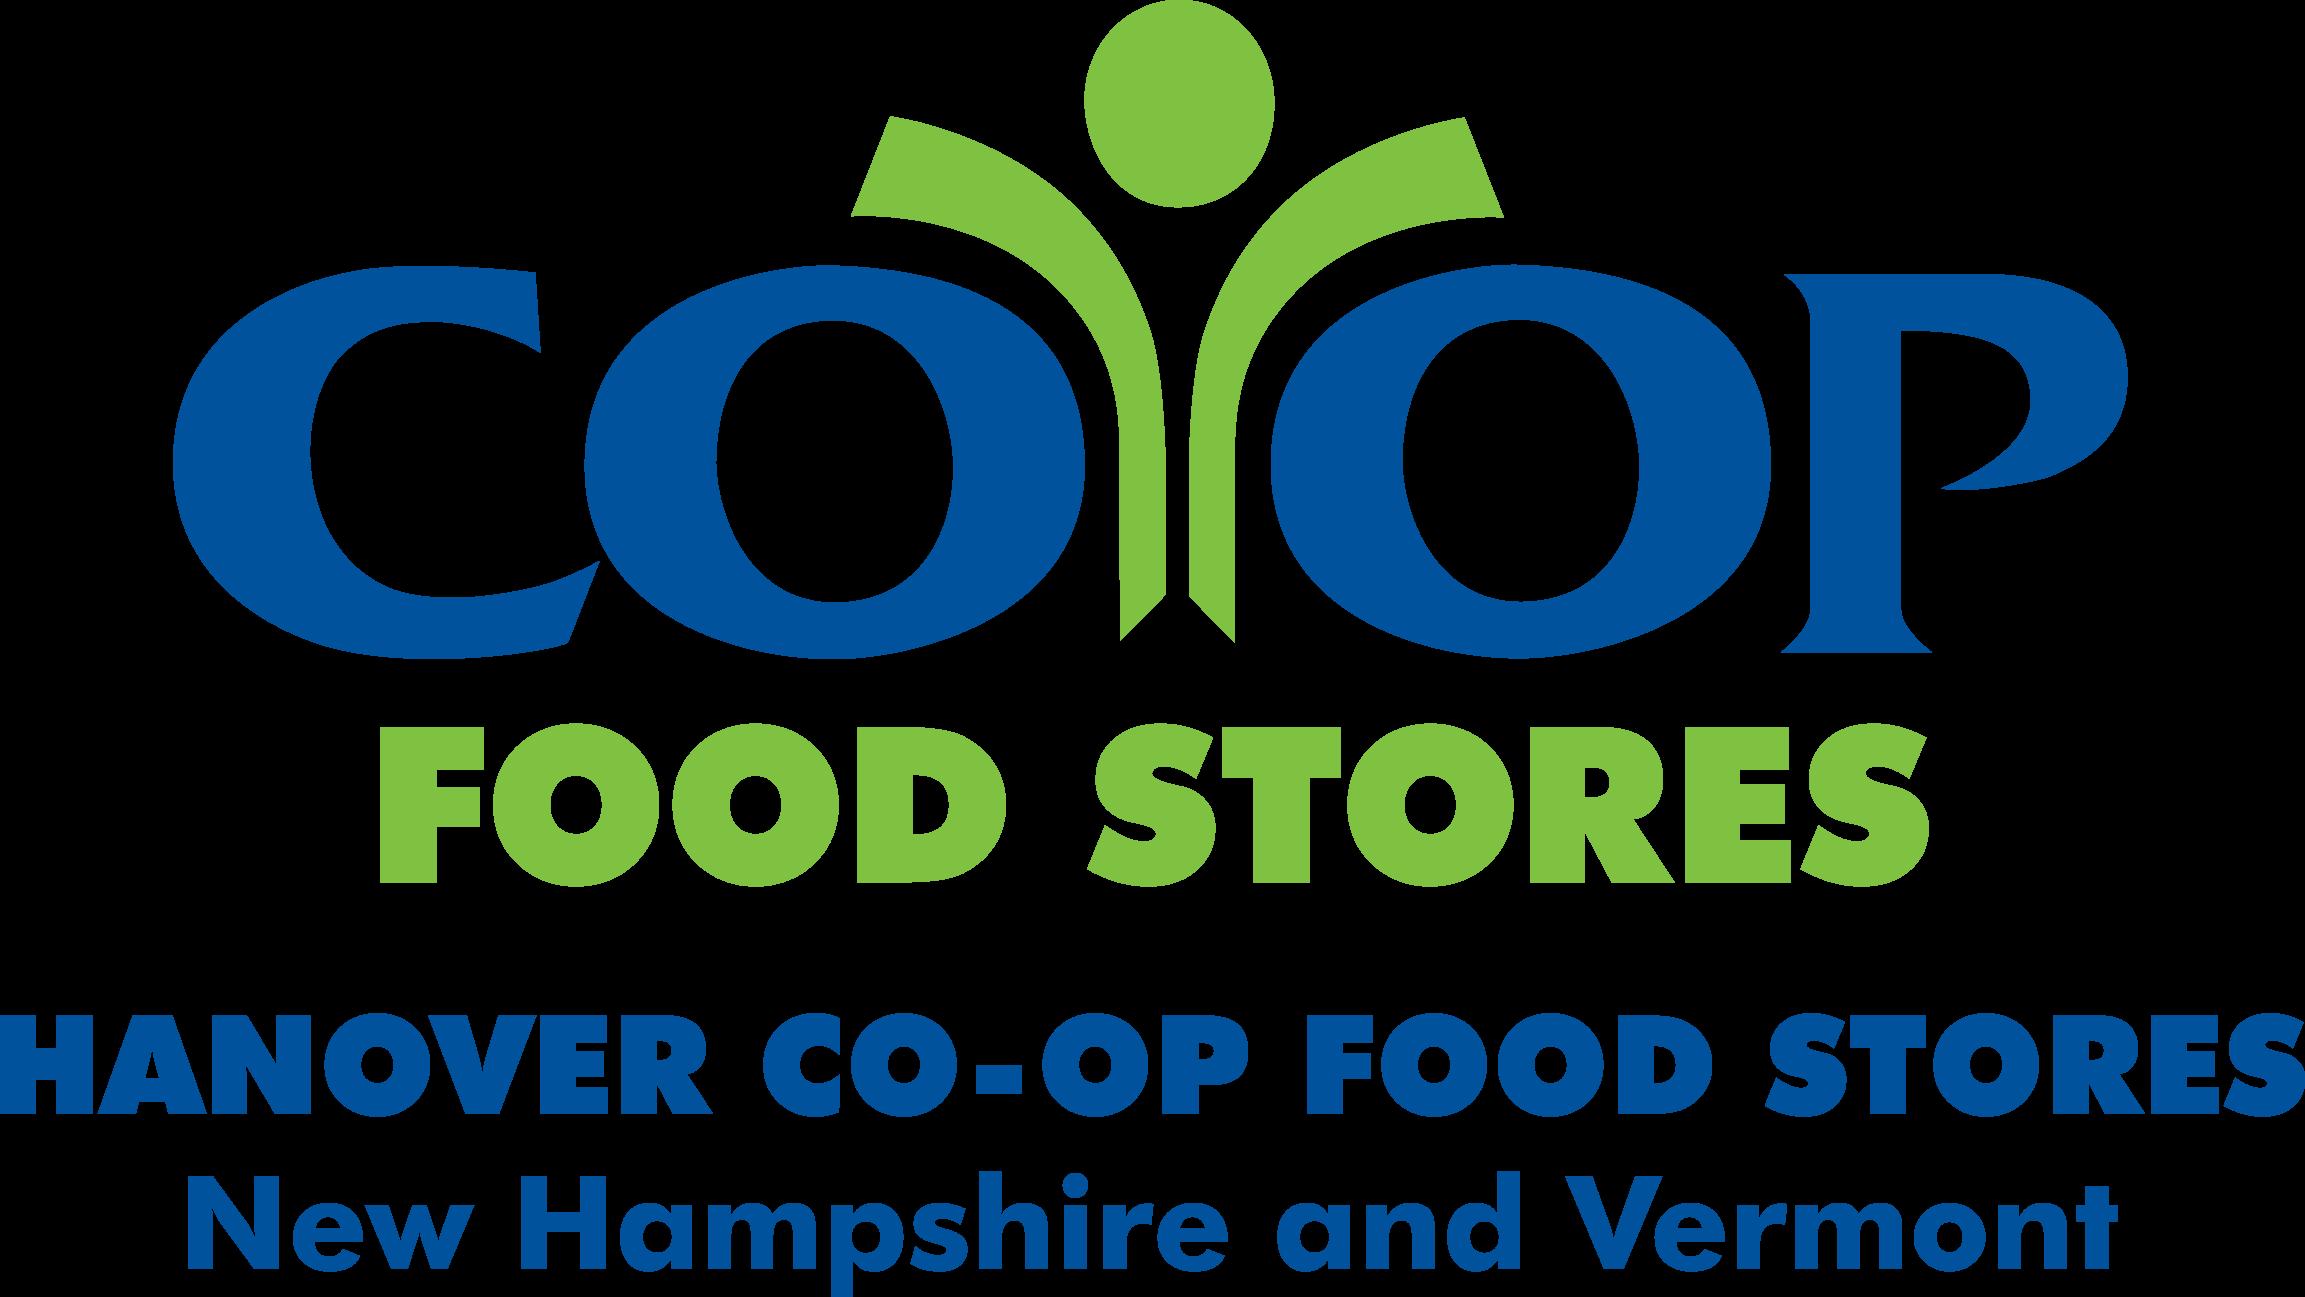 hanover_coop_logo.png